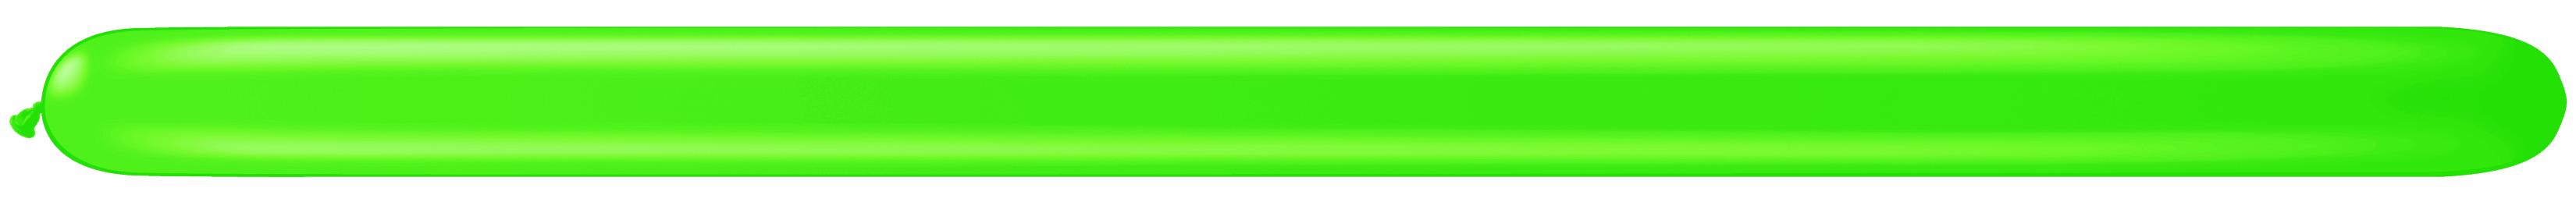 260Q Spring Green 100 Count Qualatex Plain Latex